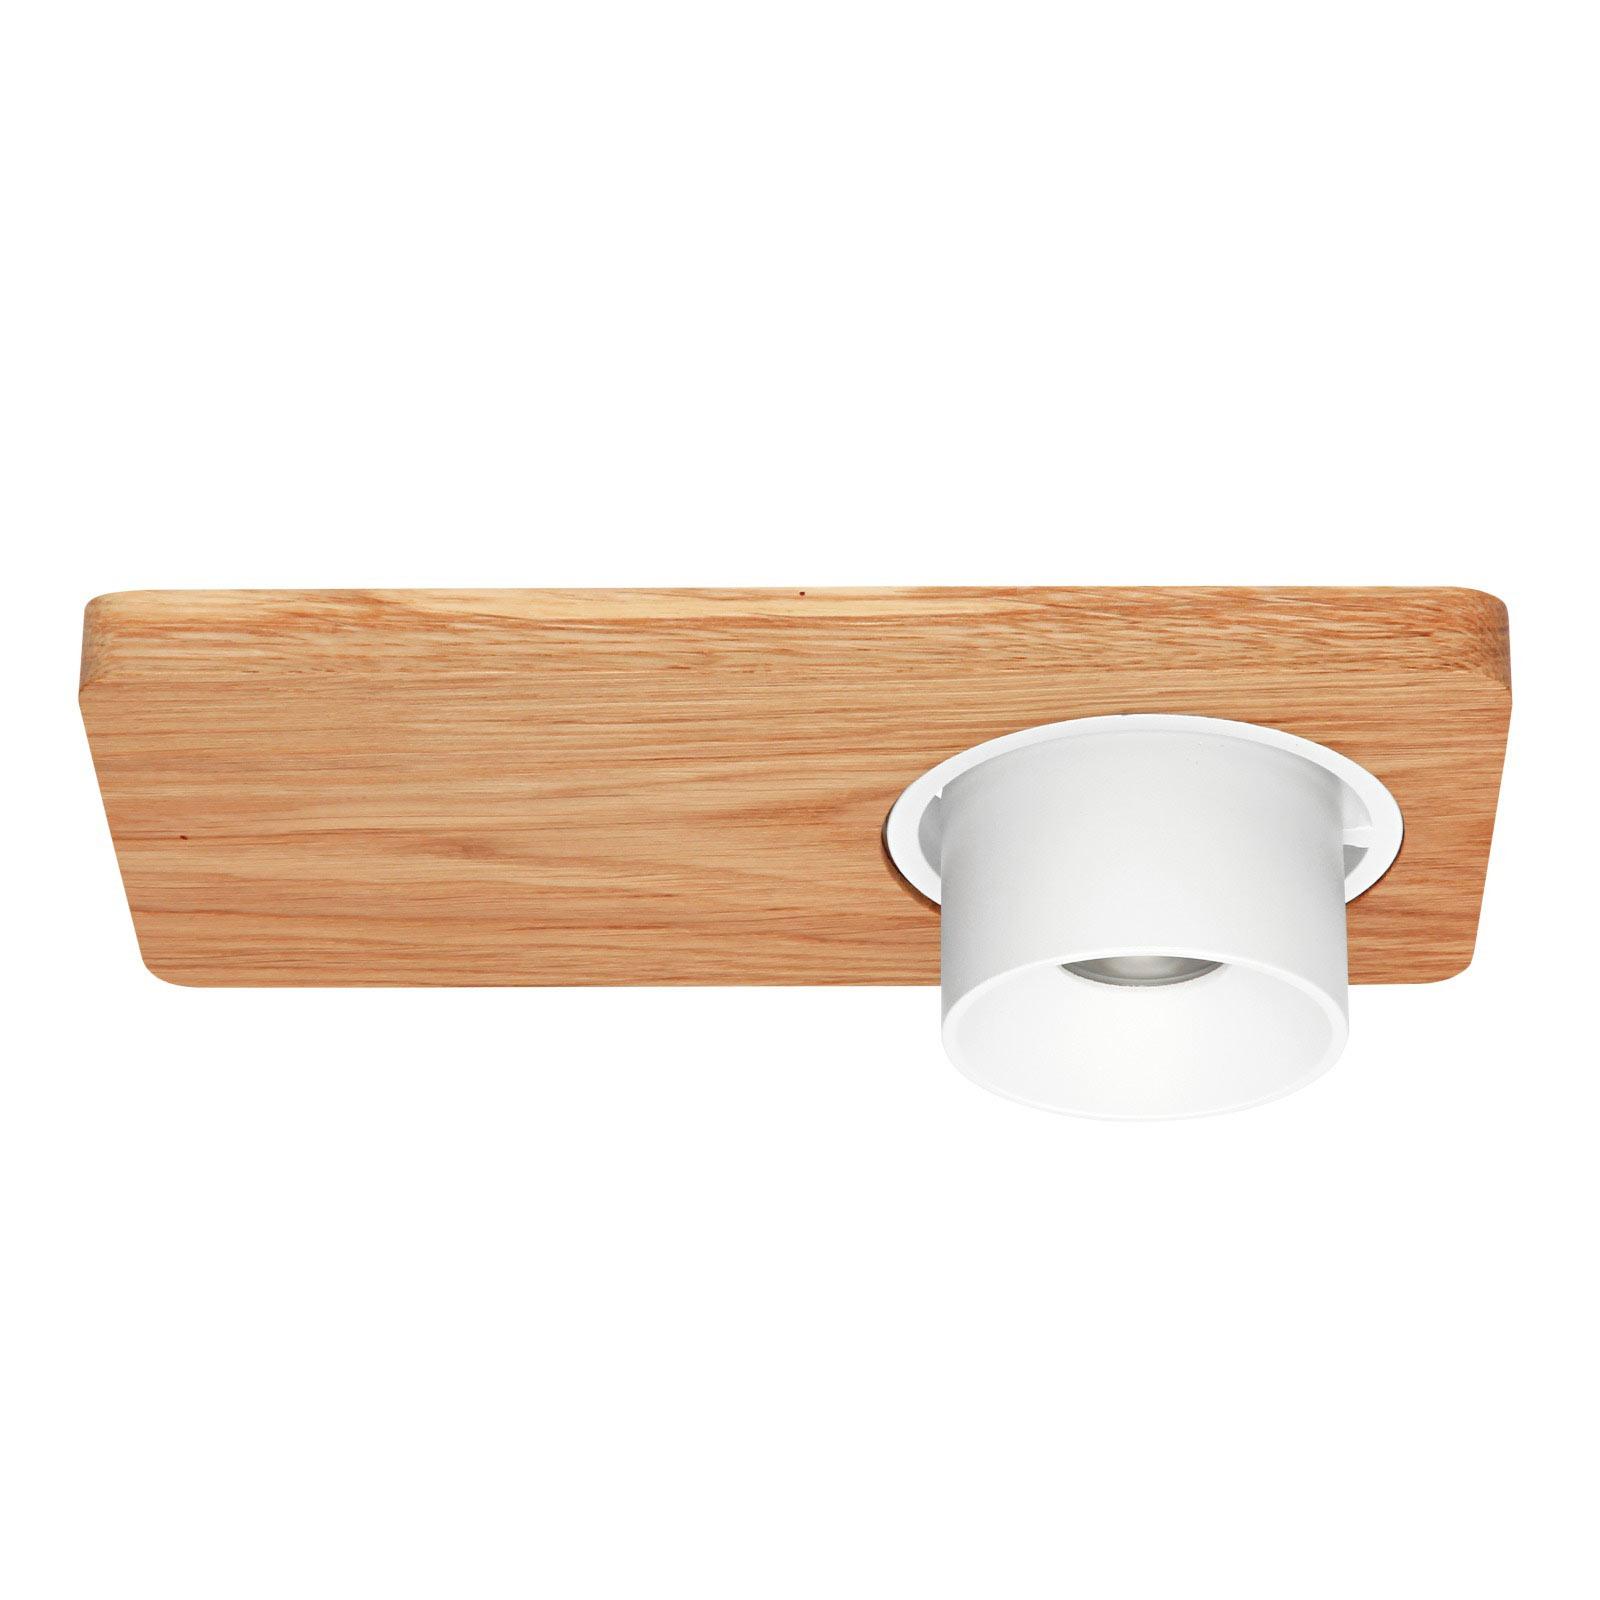 LED plafondlamp Beebo S, eiken licht